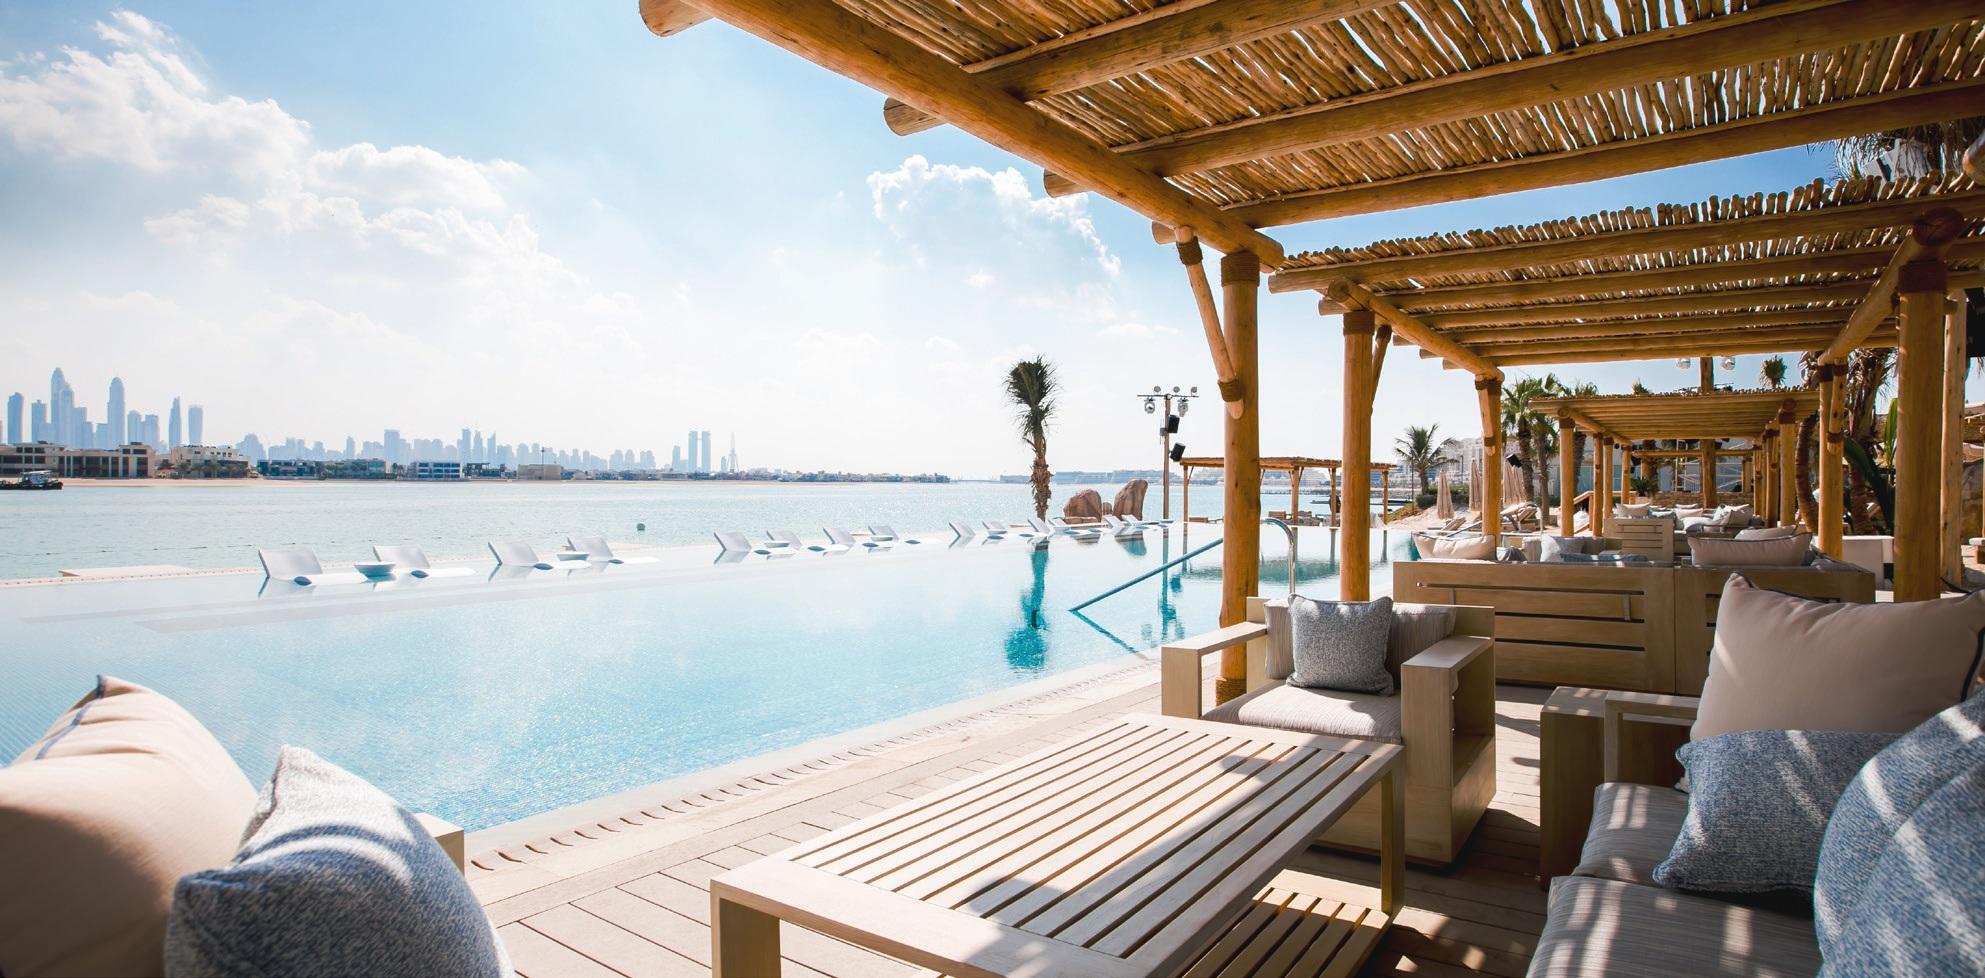 TRAVEL MIDDLE EAST DUBAI WHITE BEACH